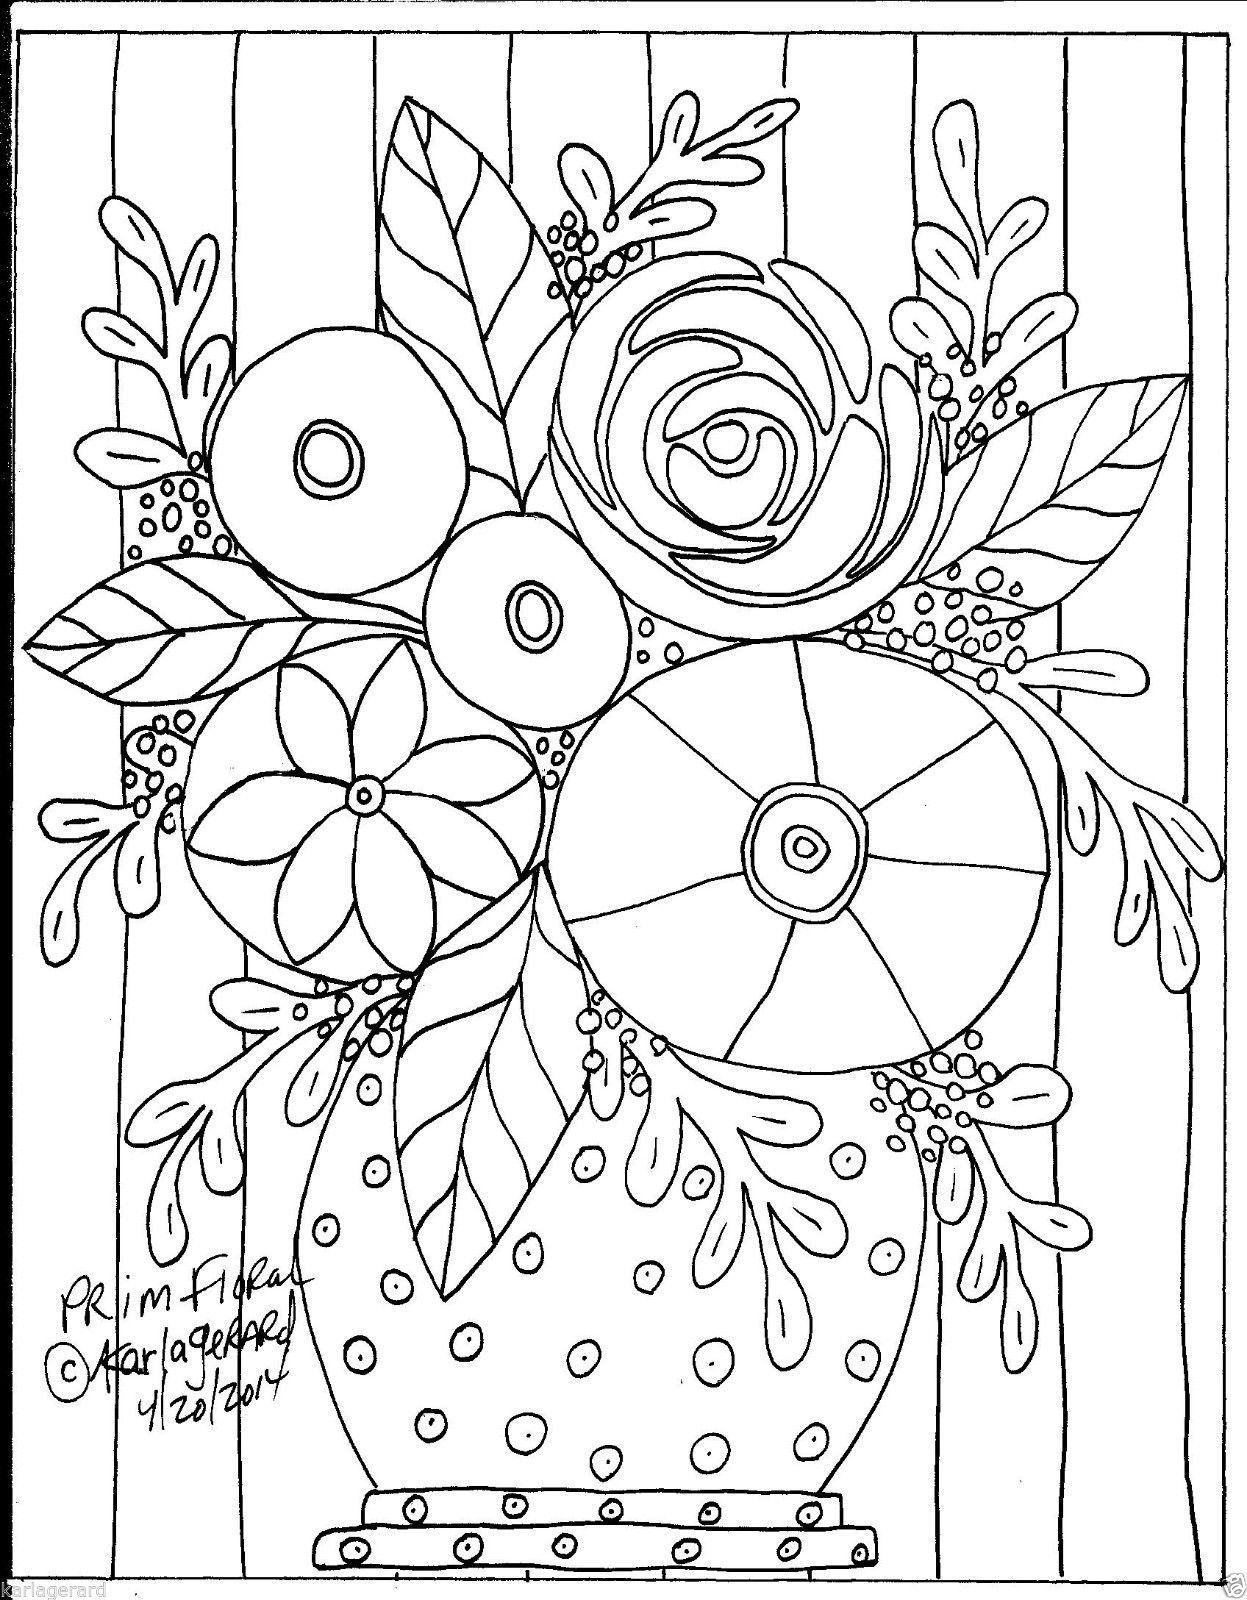 Coloriage A Imprimer Karla Gerard.Coloriage A Imprimer Karla Gerard